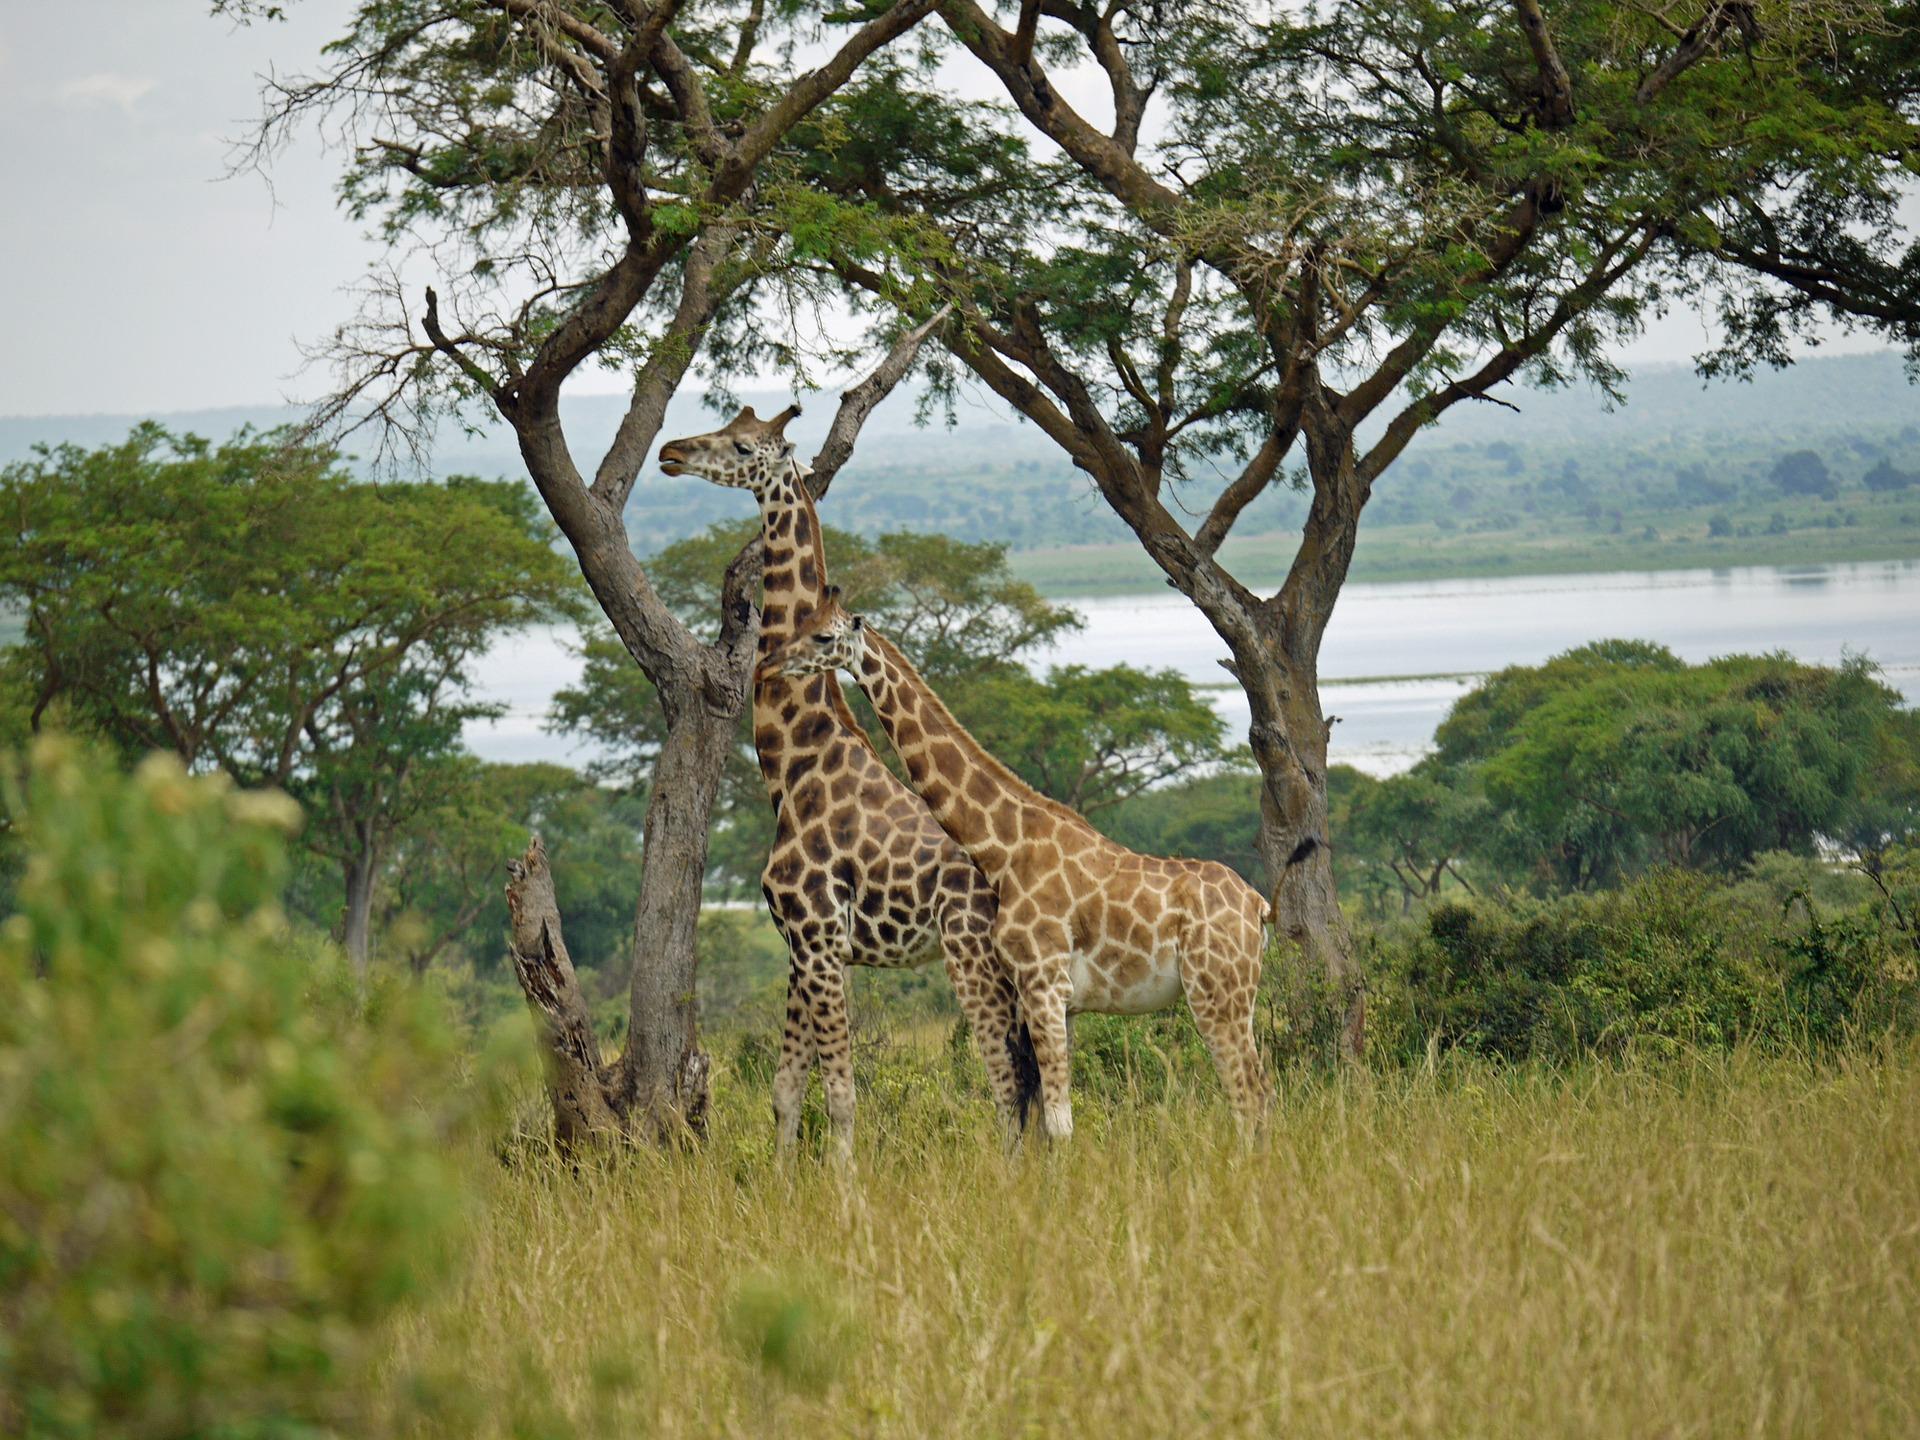 rothschild-giraffes-1416574_1920